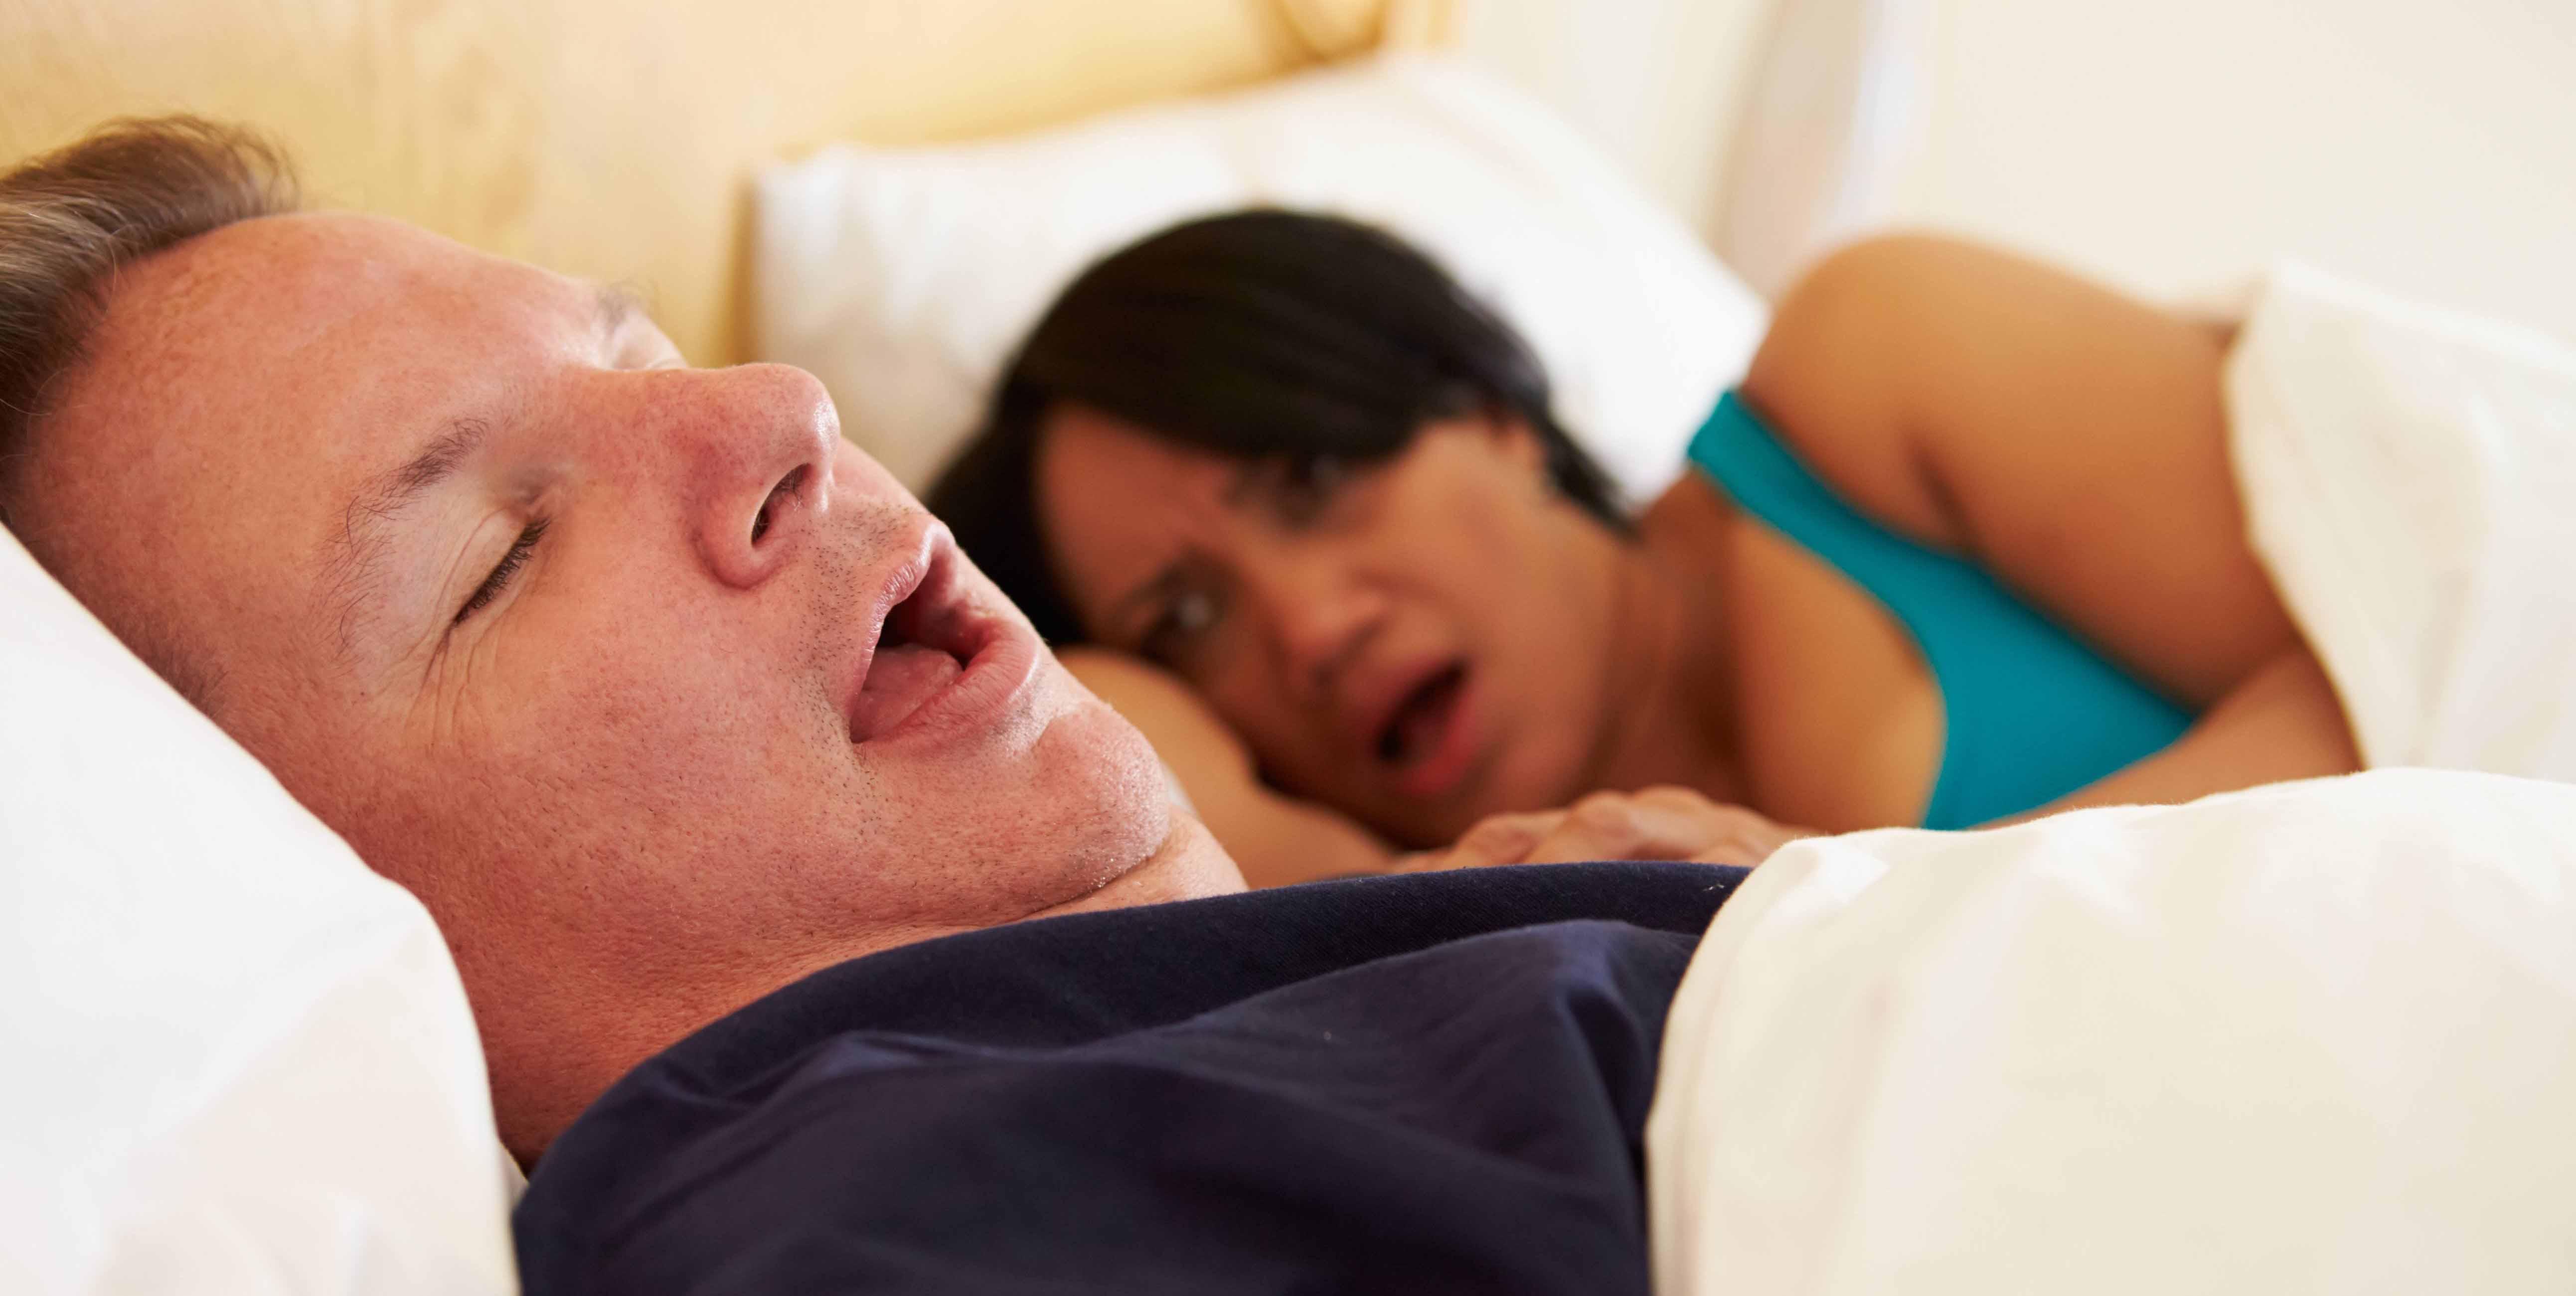 obesity causes snoring